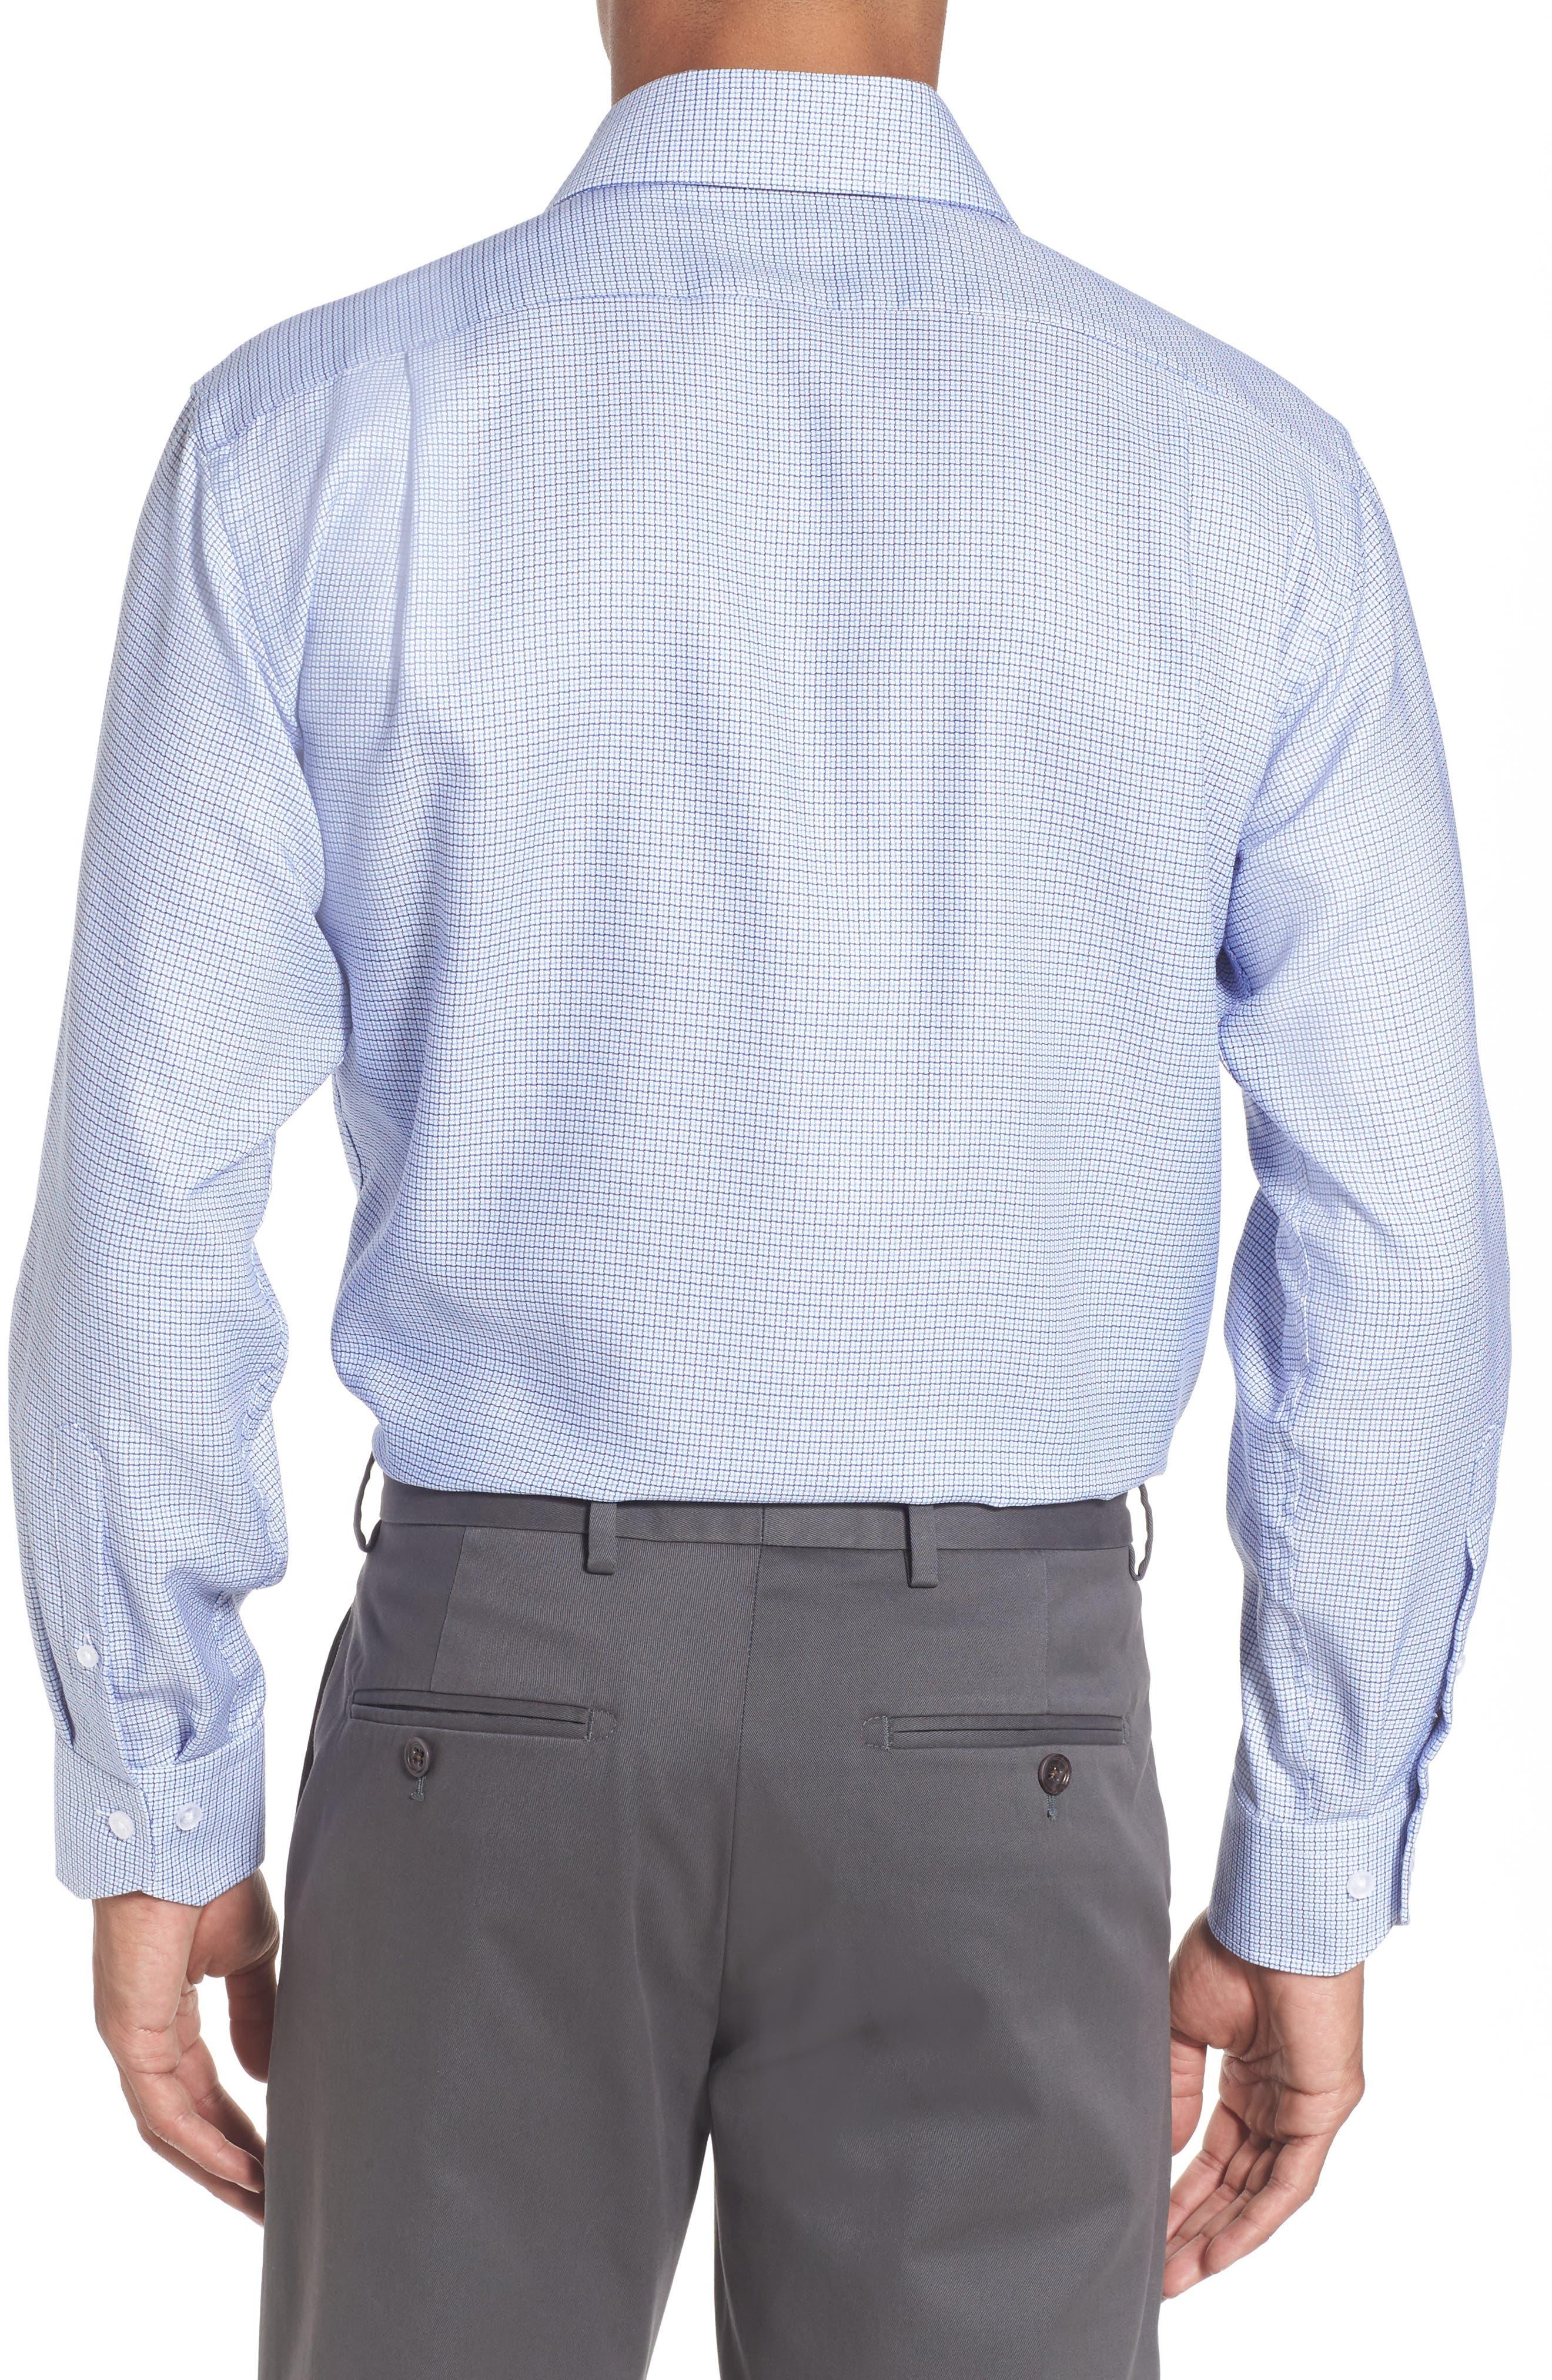 LORENZO UOMO, Trim Fit Check Dress Shirt, Alternate thumbnail 2, color, LIGHT BLUE/ NAVY